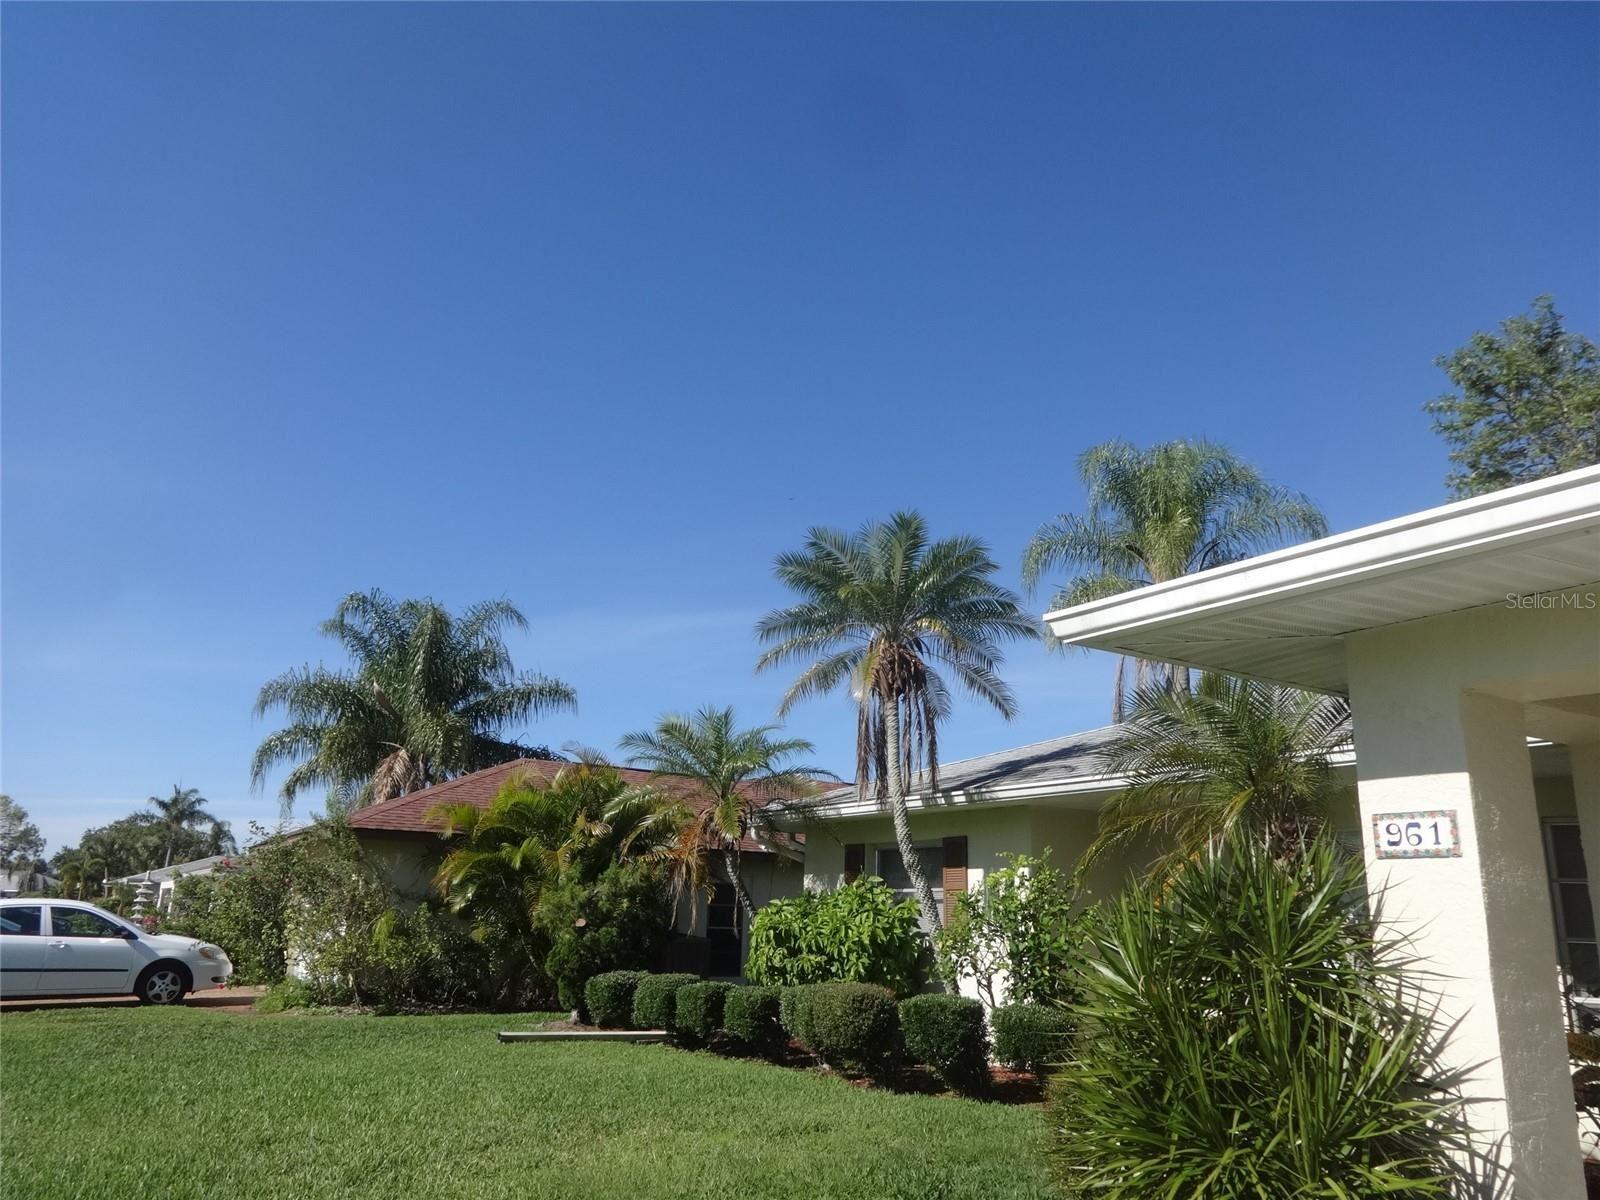 Photo of 961 E GONDOLA DRIVE, VENICE, FL 34293 (MLS # N6115848)